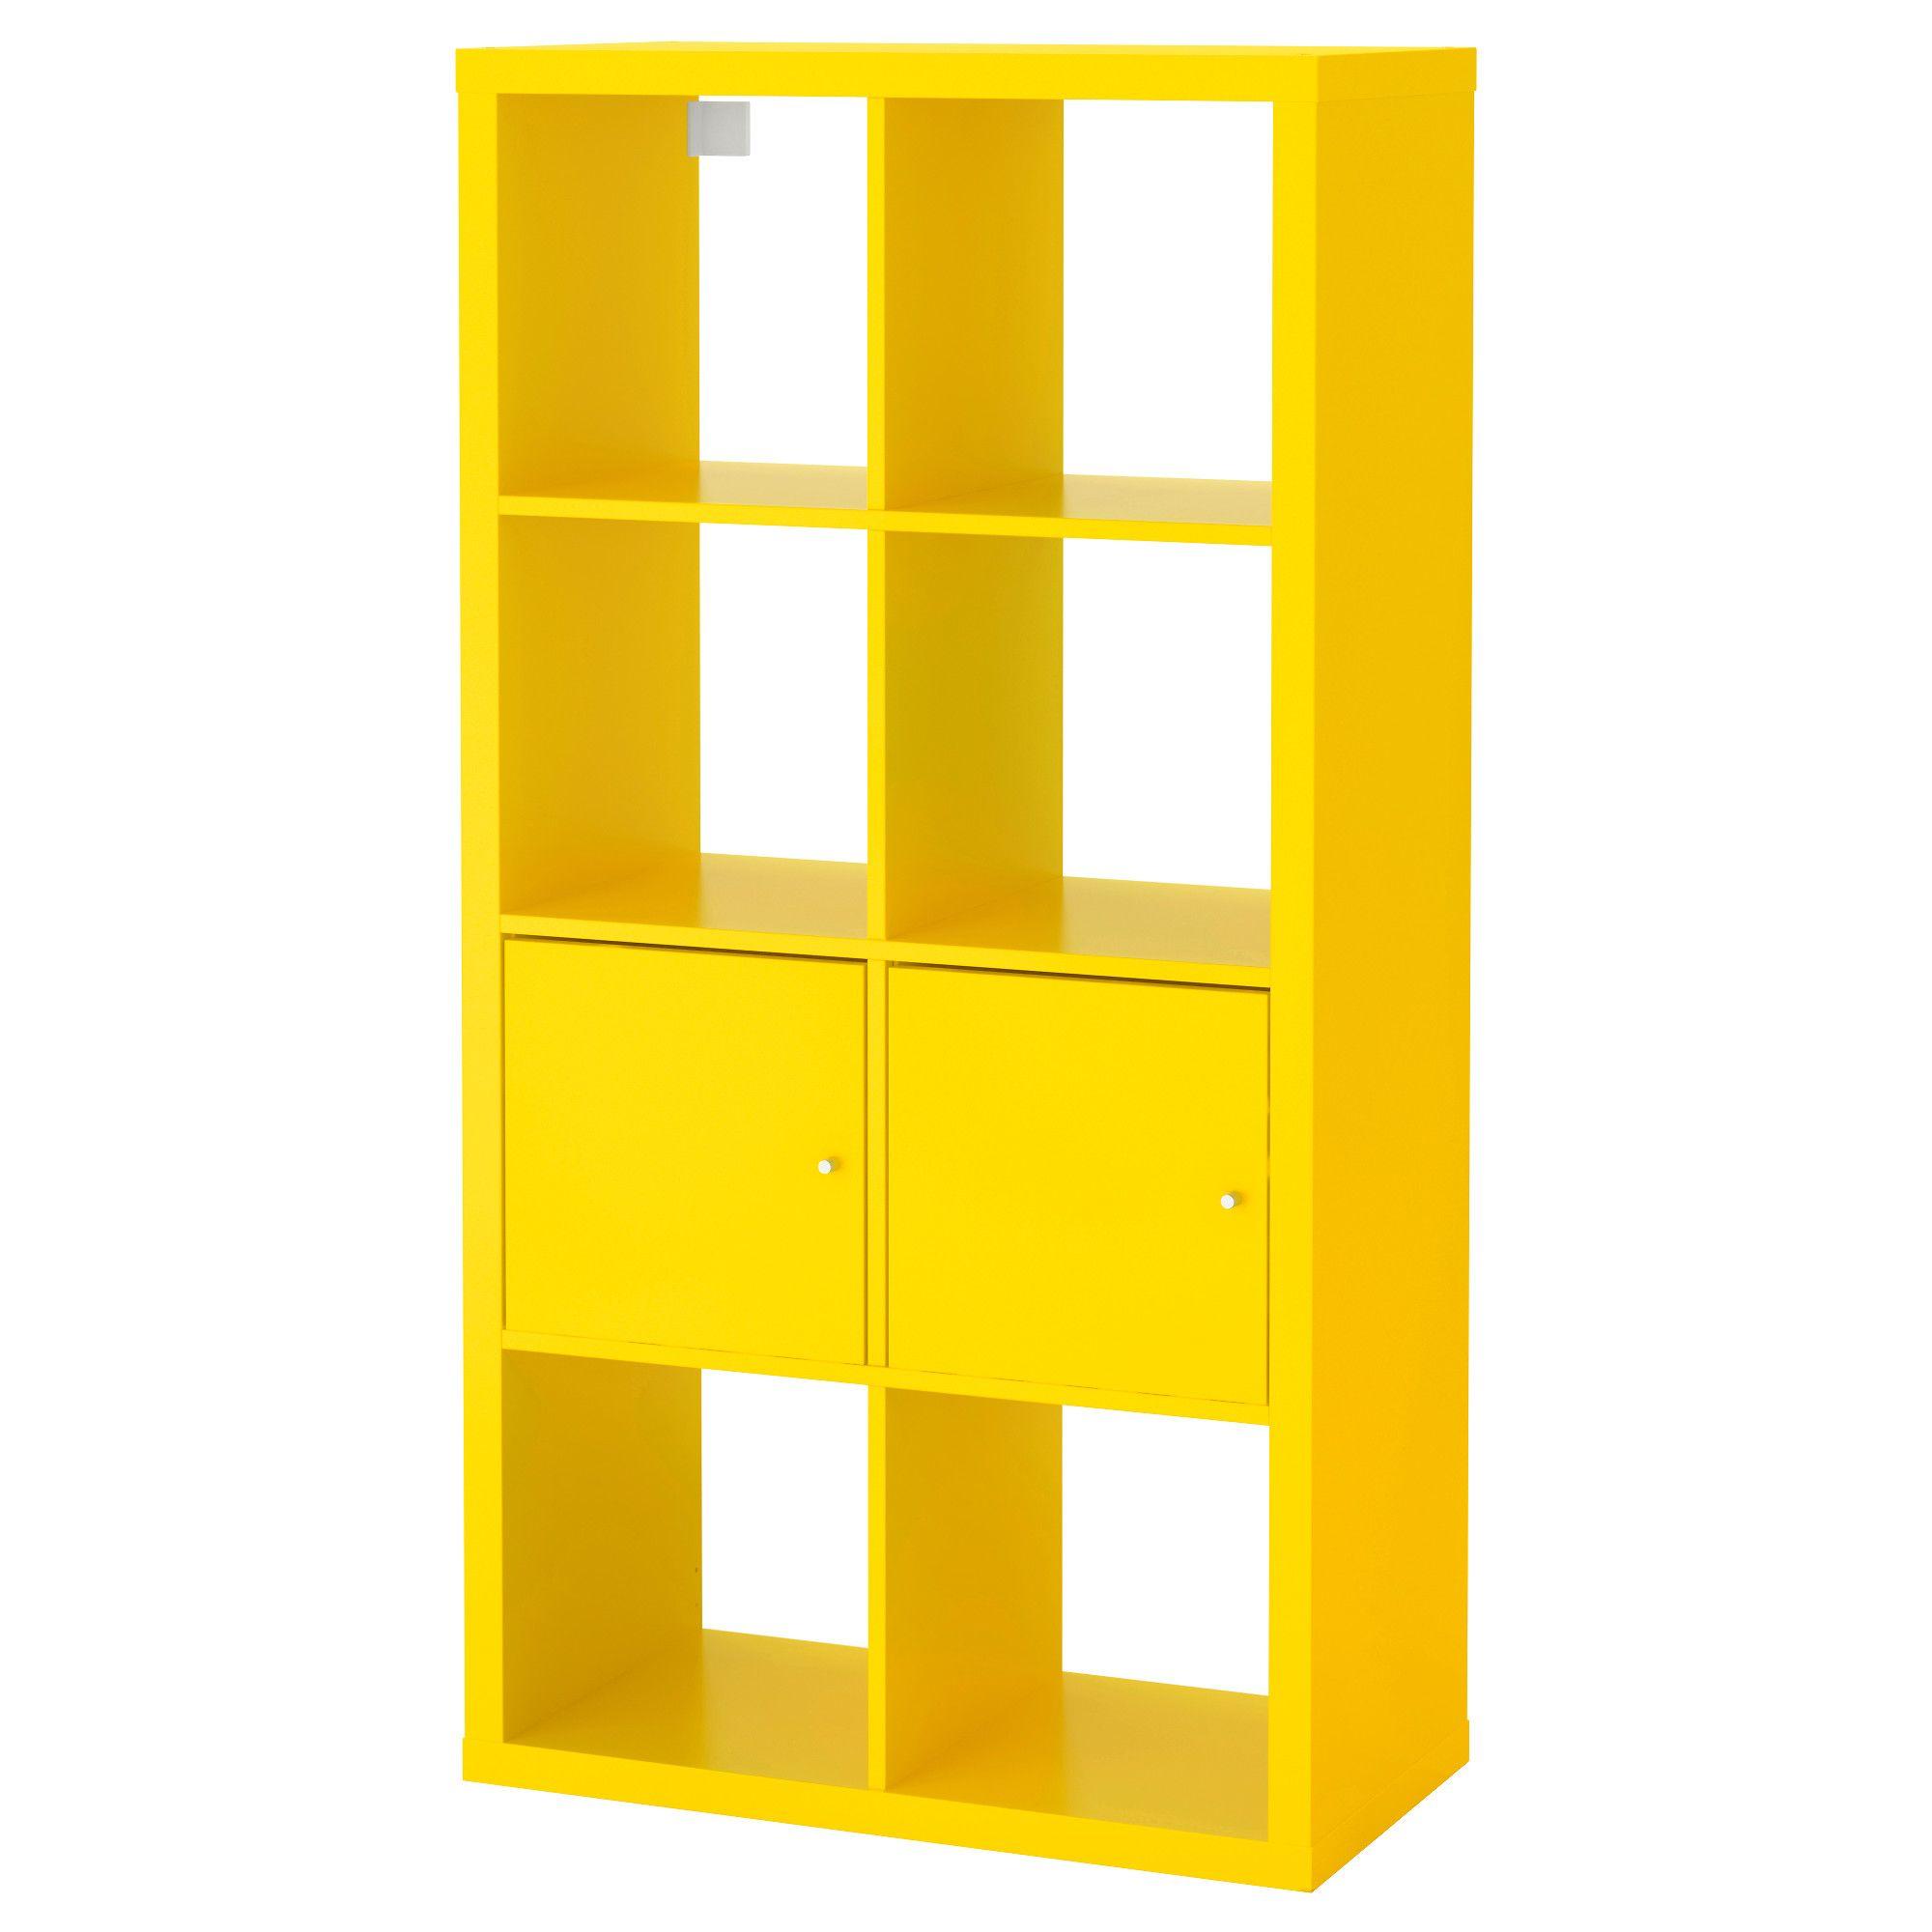 Elegant KALLAX Regal mit T ren gelb Jetzt bestellen unter https moebel